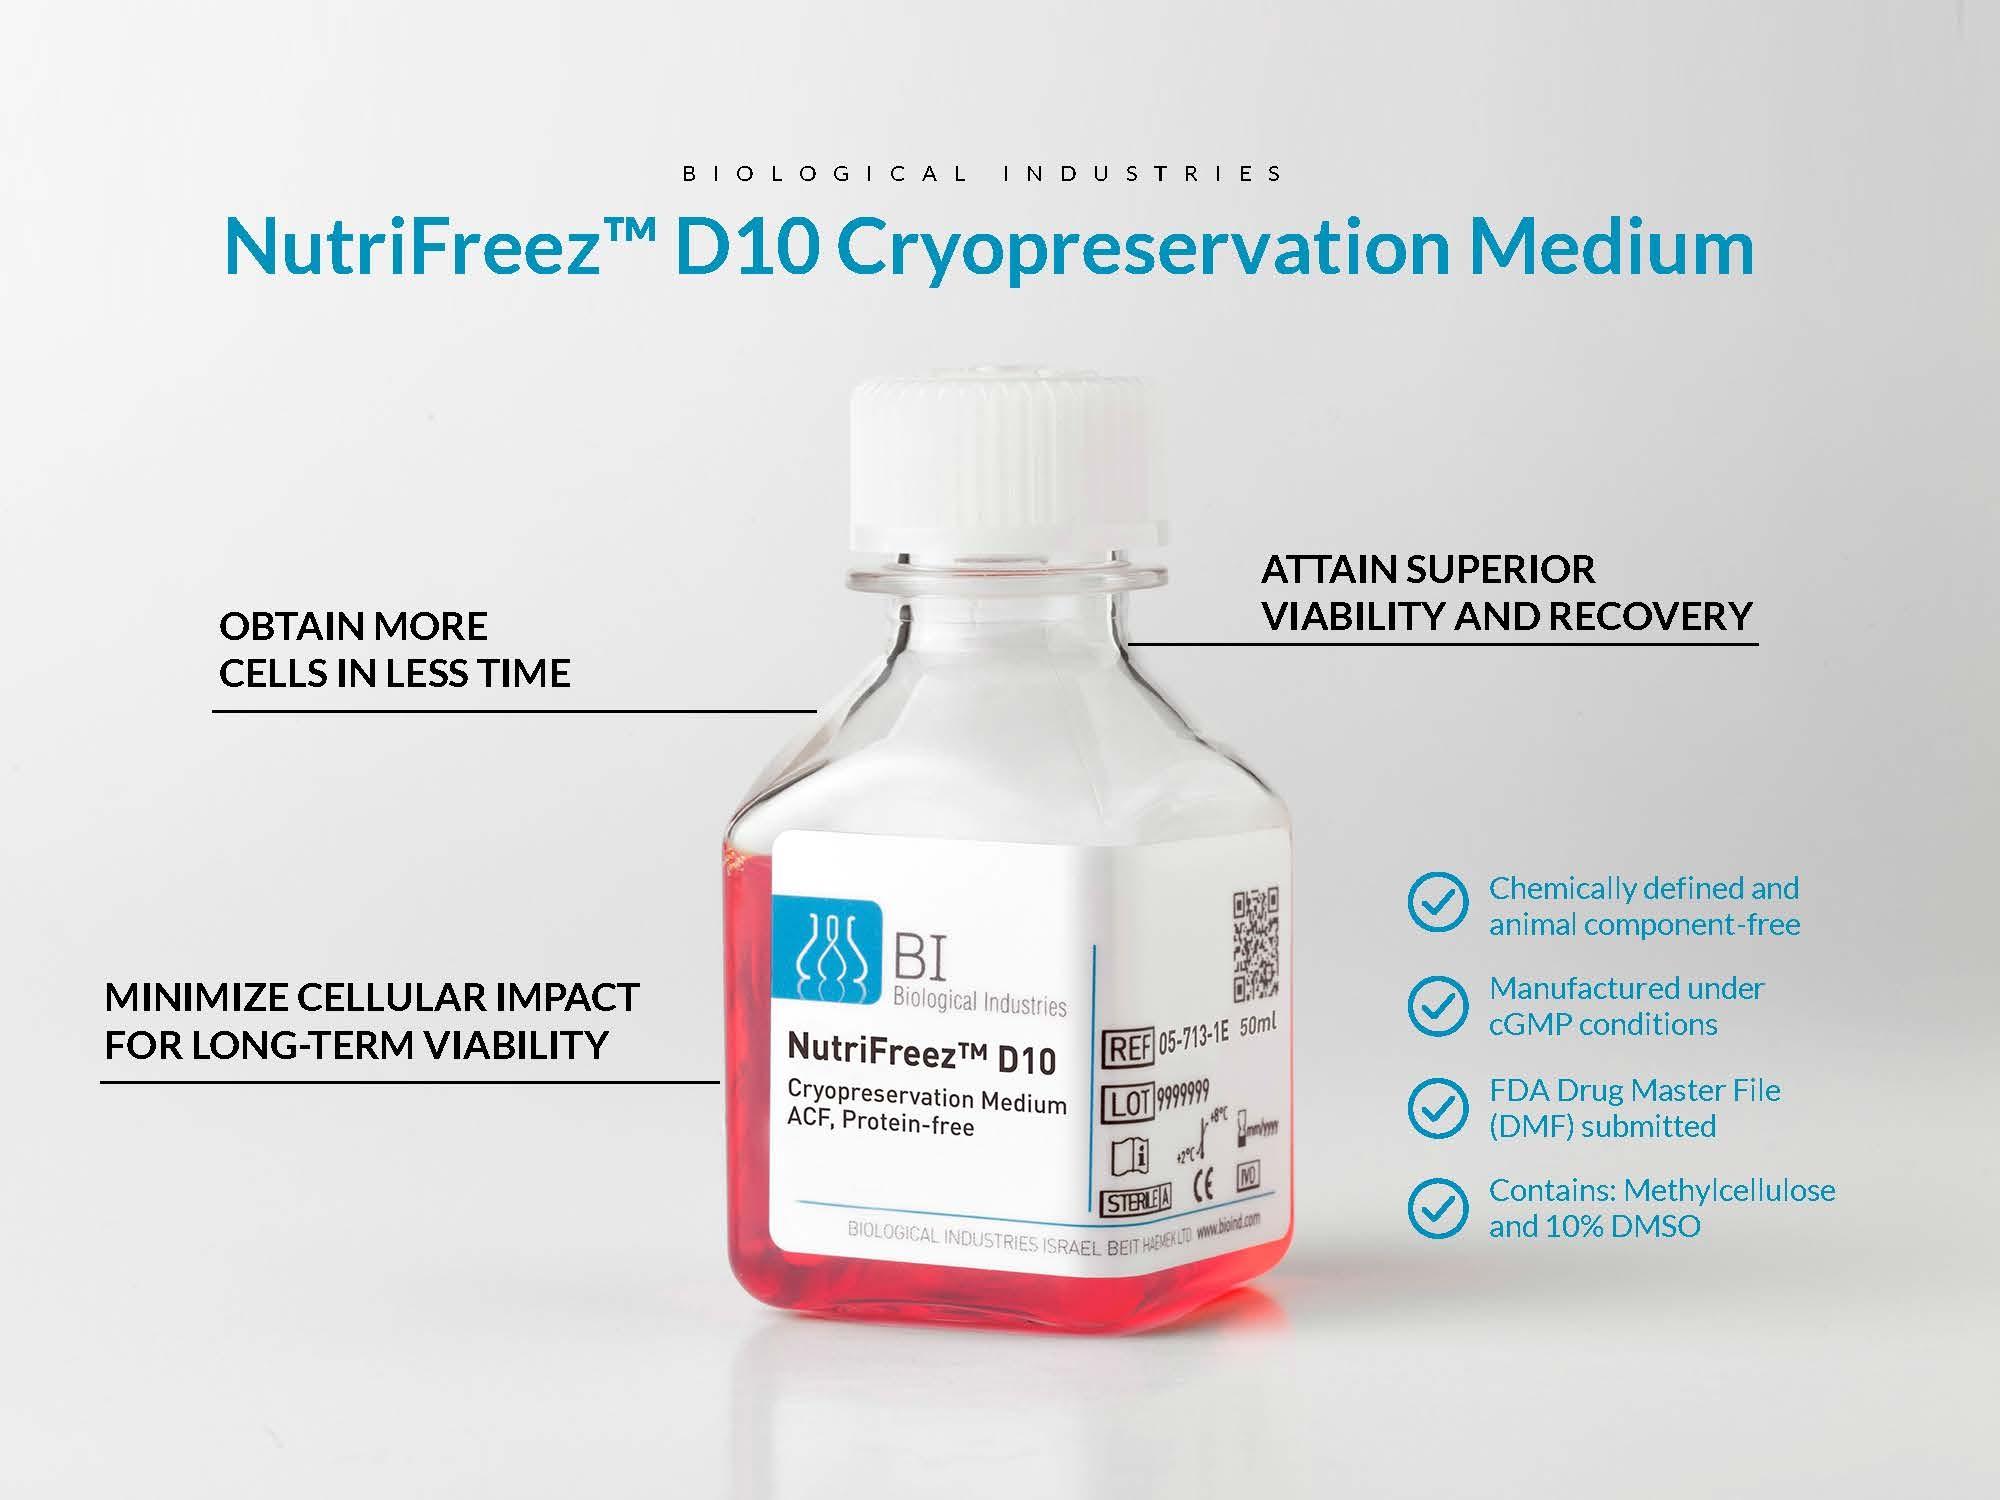 NutriFreez D10 Cryopreservation Medium